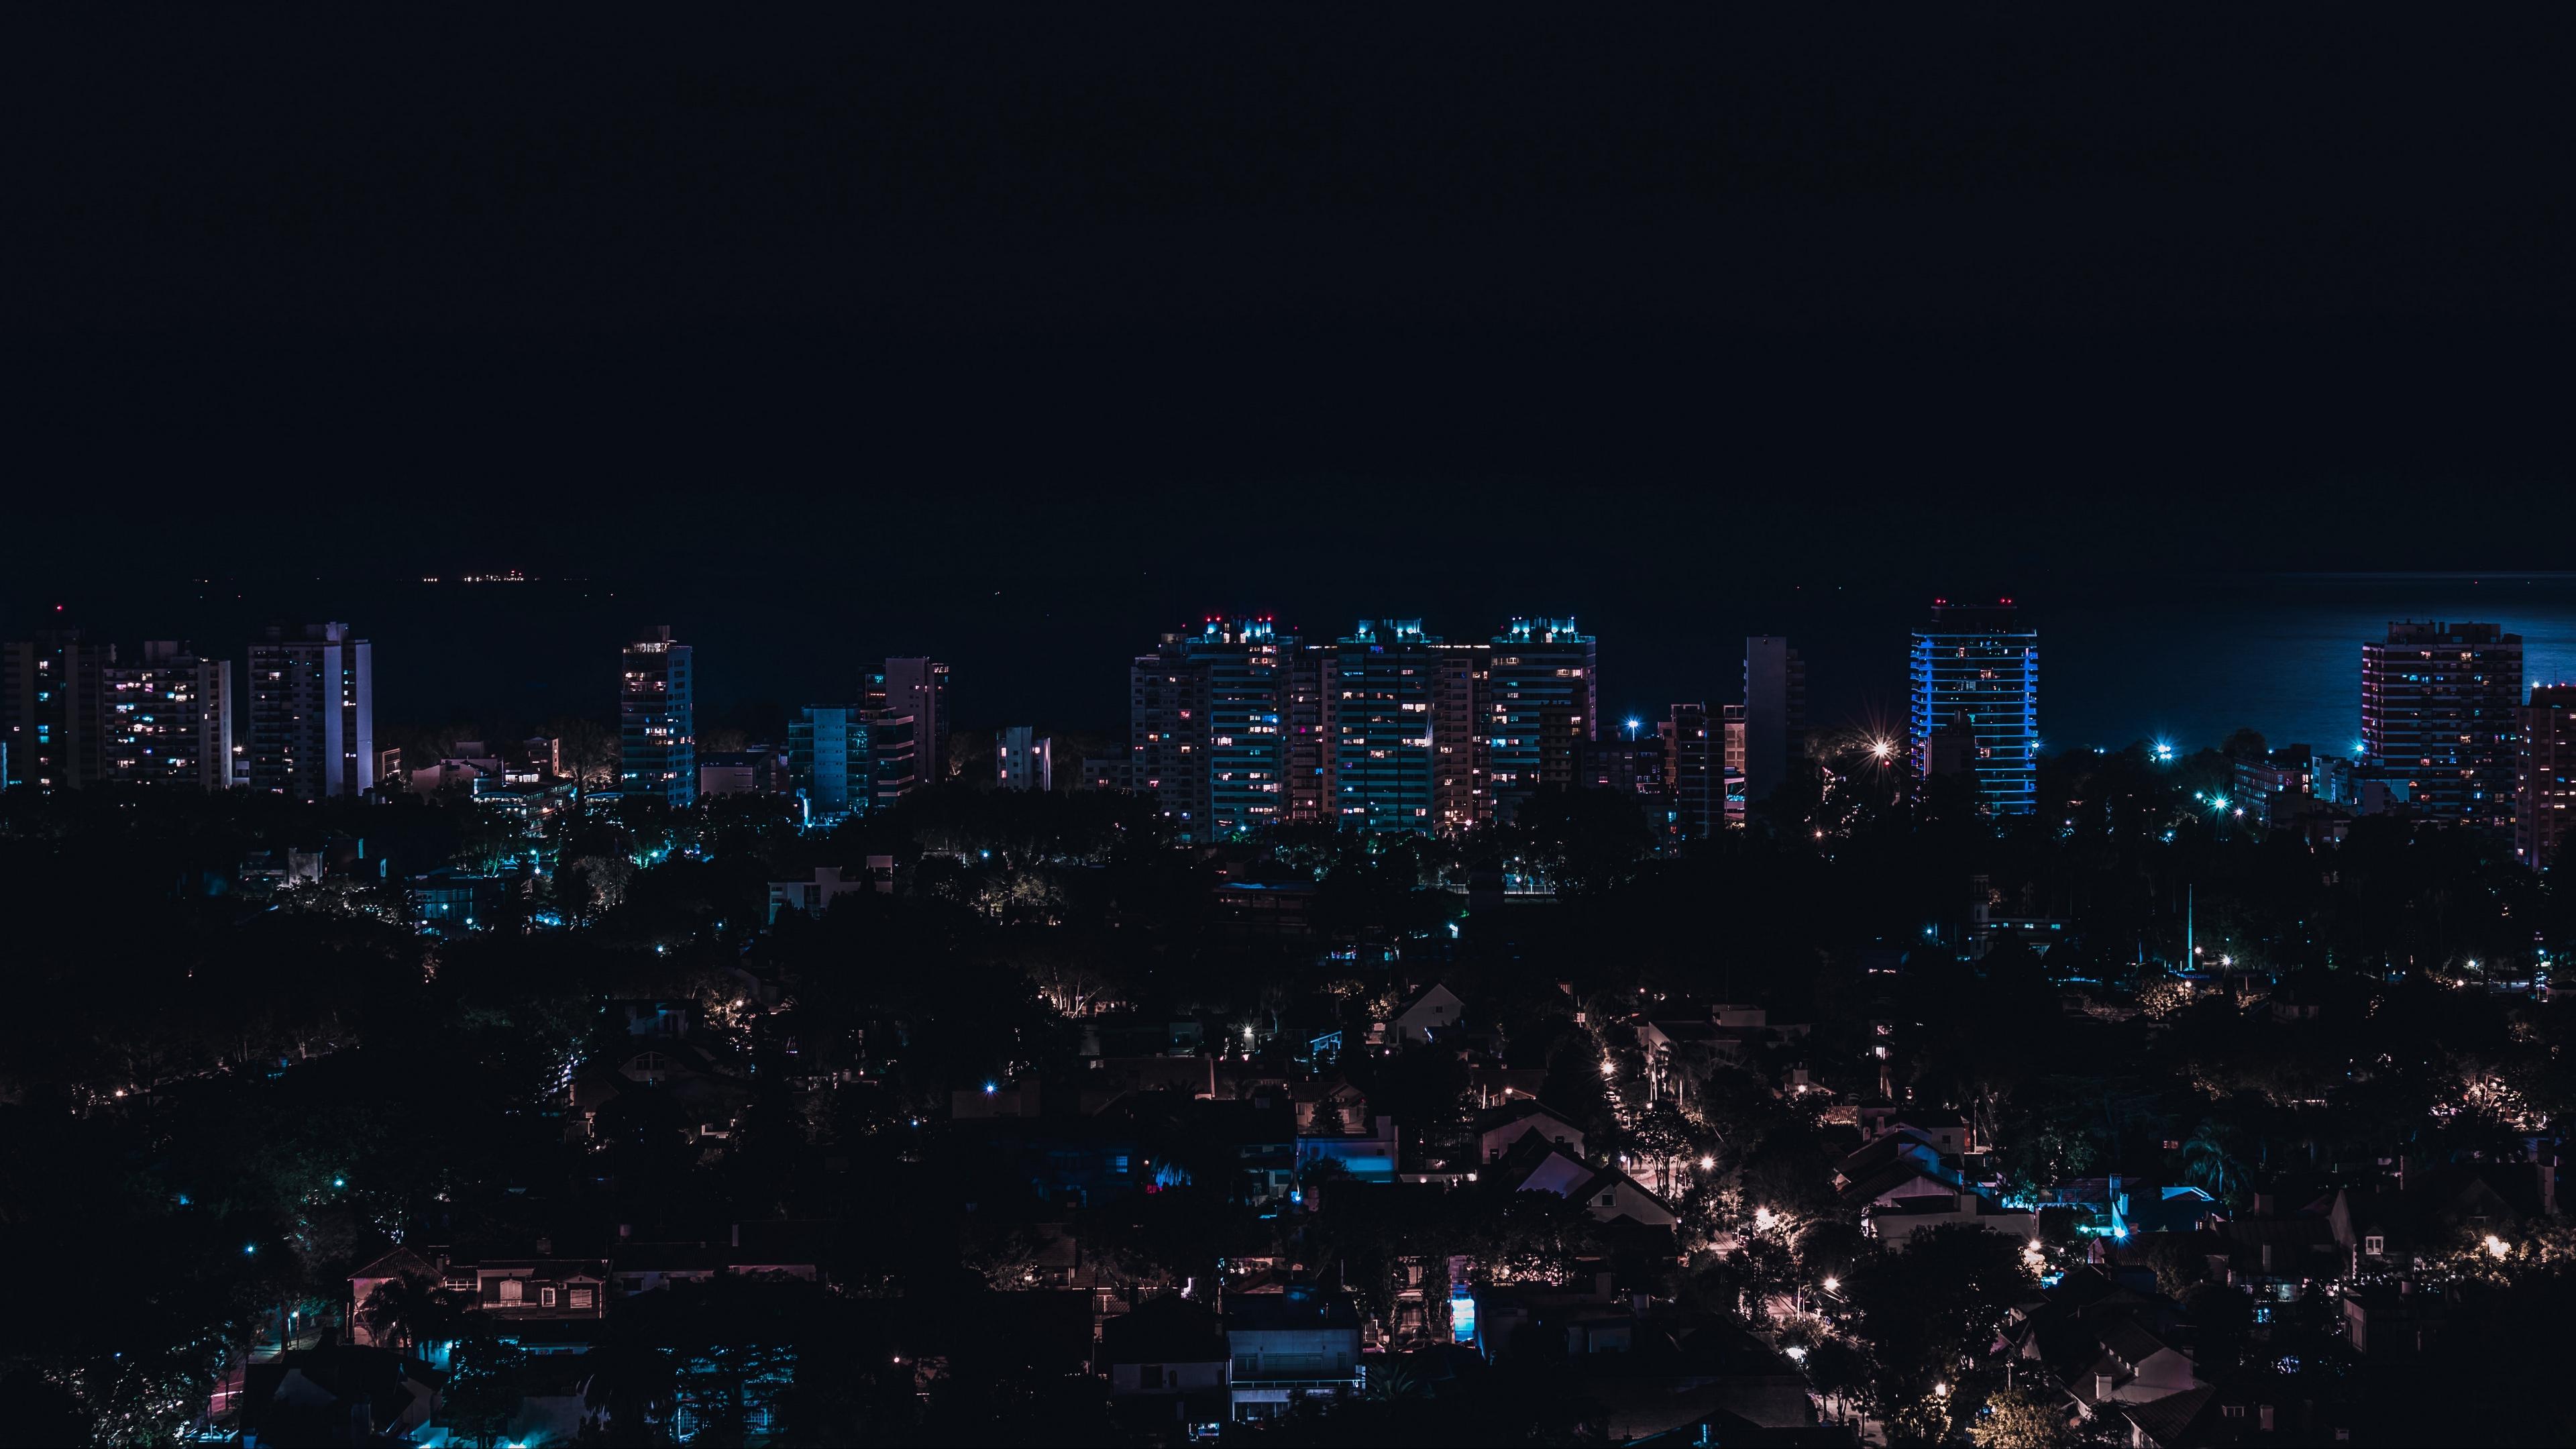 olivos argentina night city buildings city lights 4k 1538068883 - olivos, argentina, night city, buildings, city lights 4k - olivos, night city, Argentina